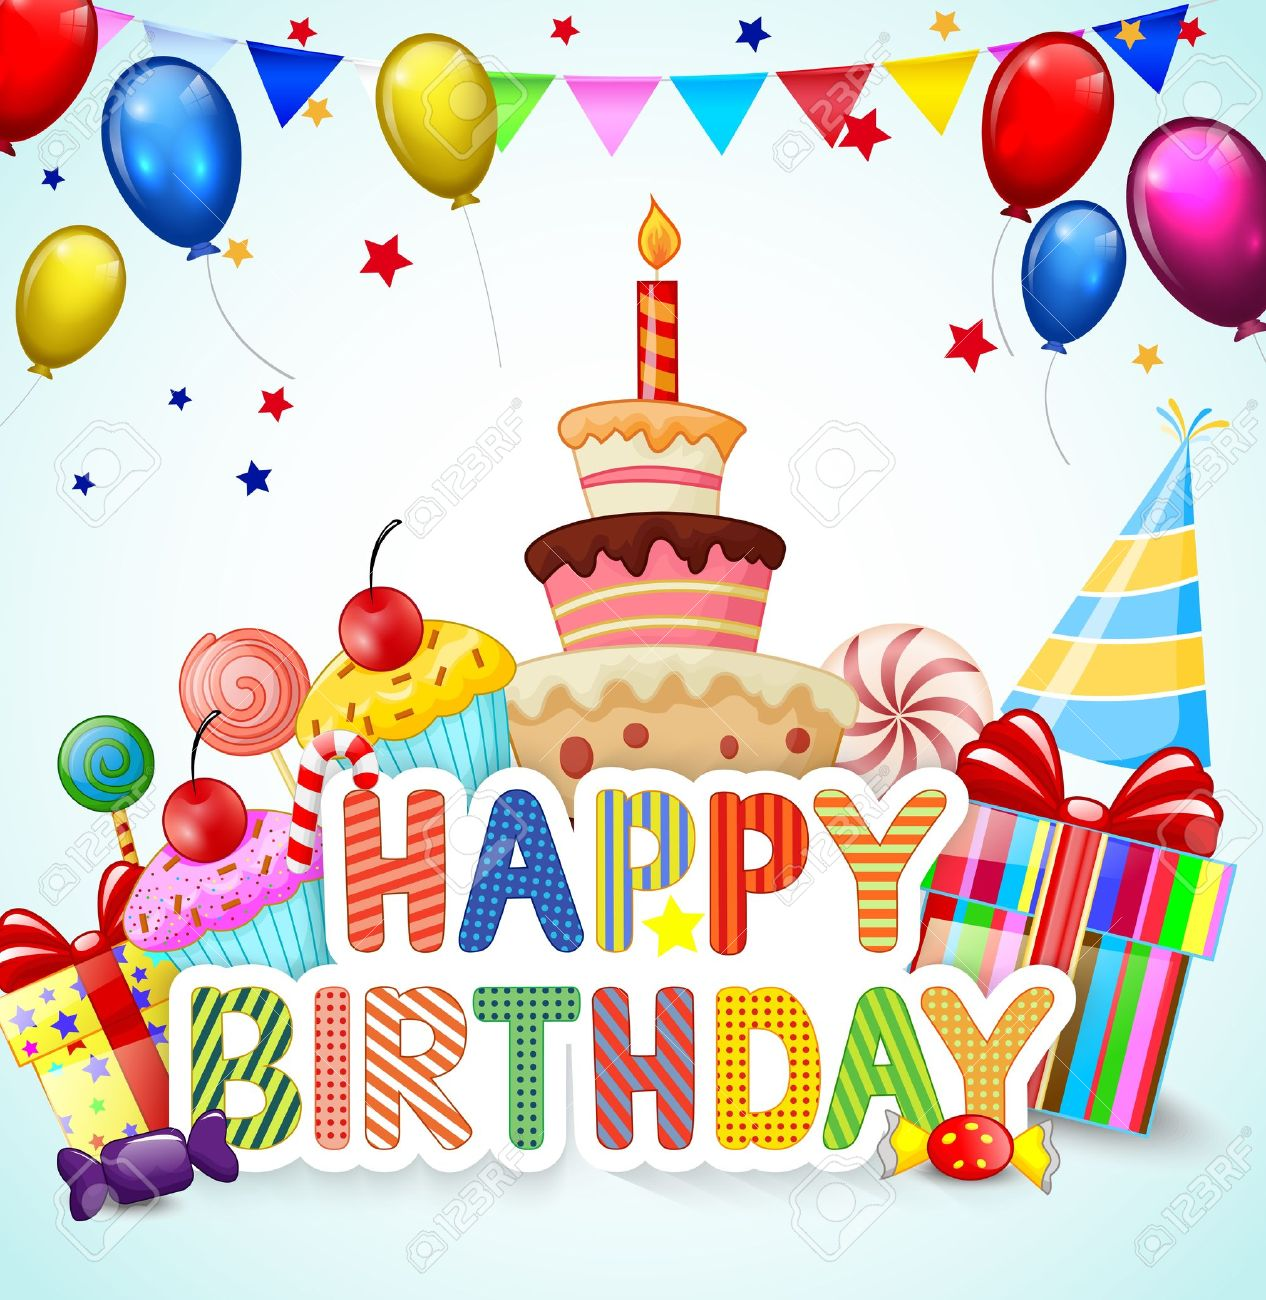 Birthday Background With Birthday Cake Cartoon Royalty Free Cliparts